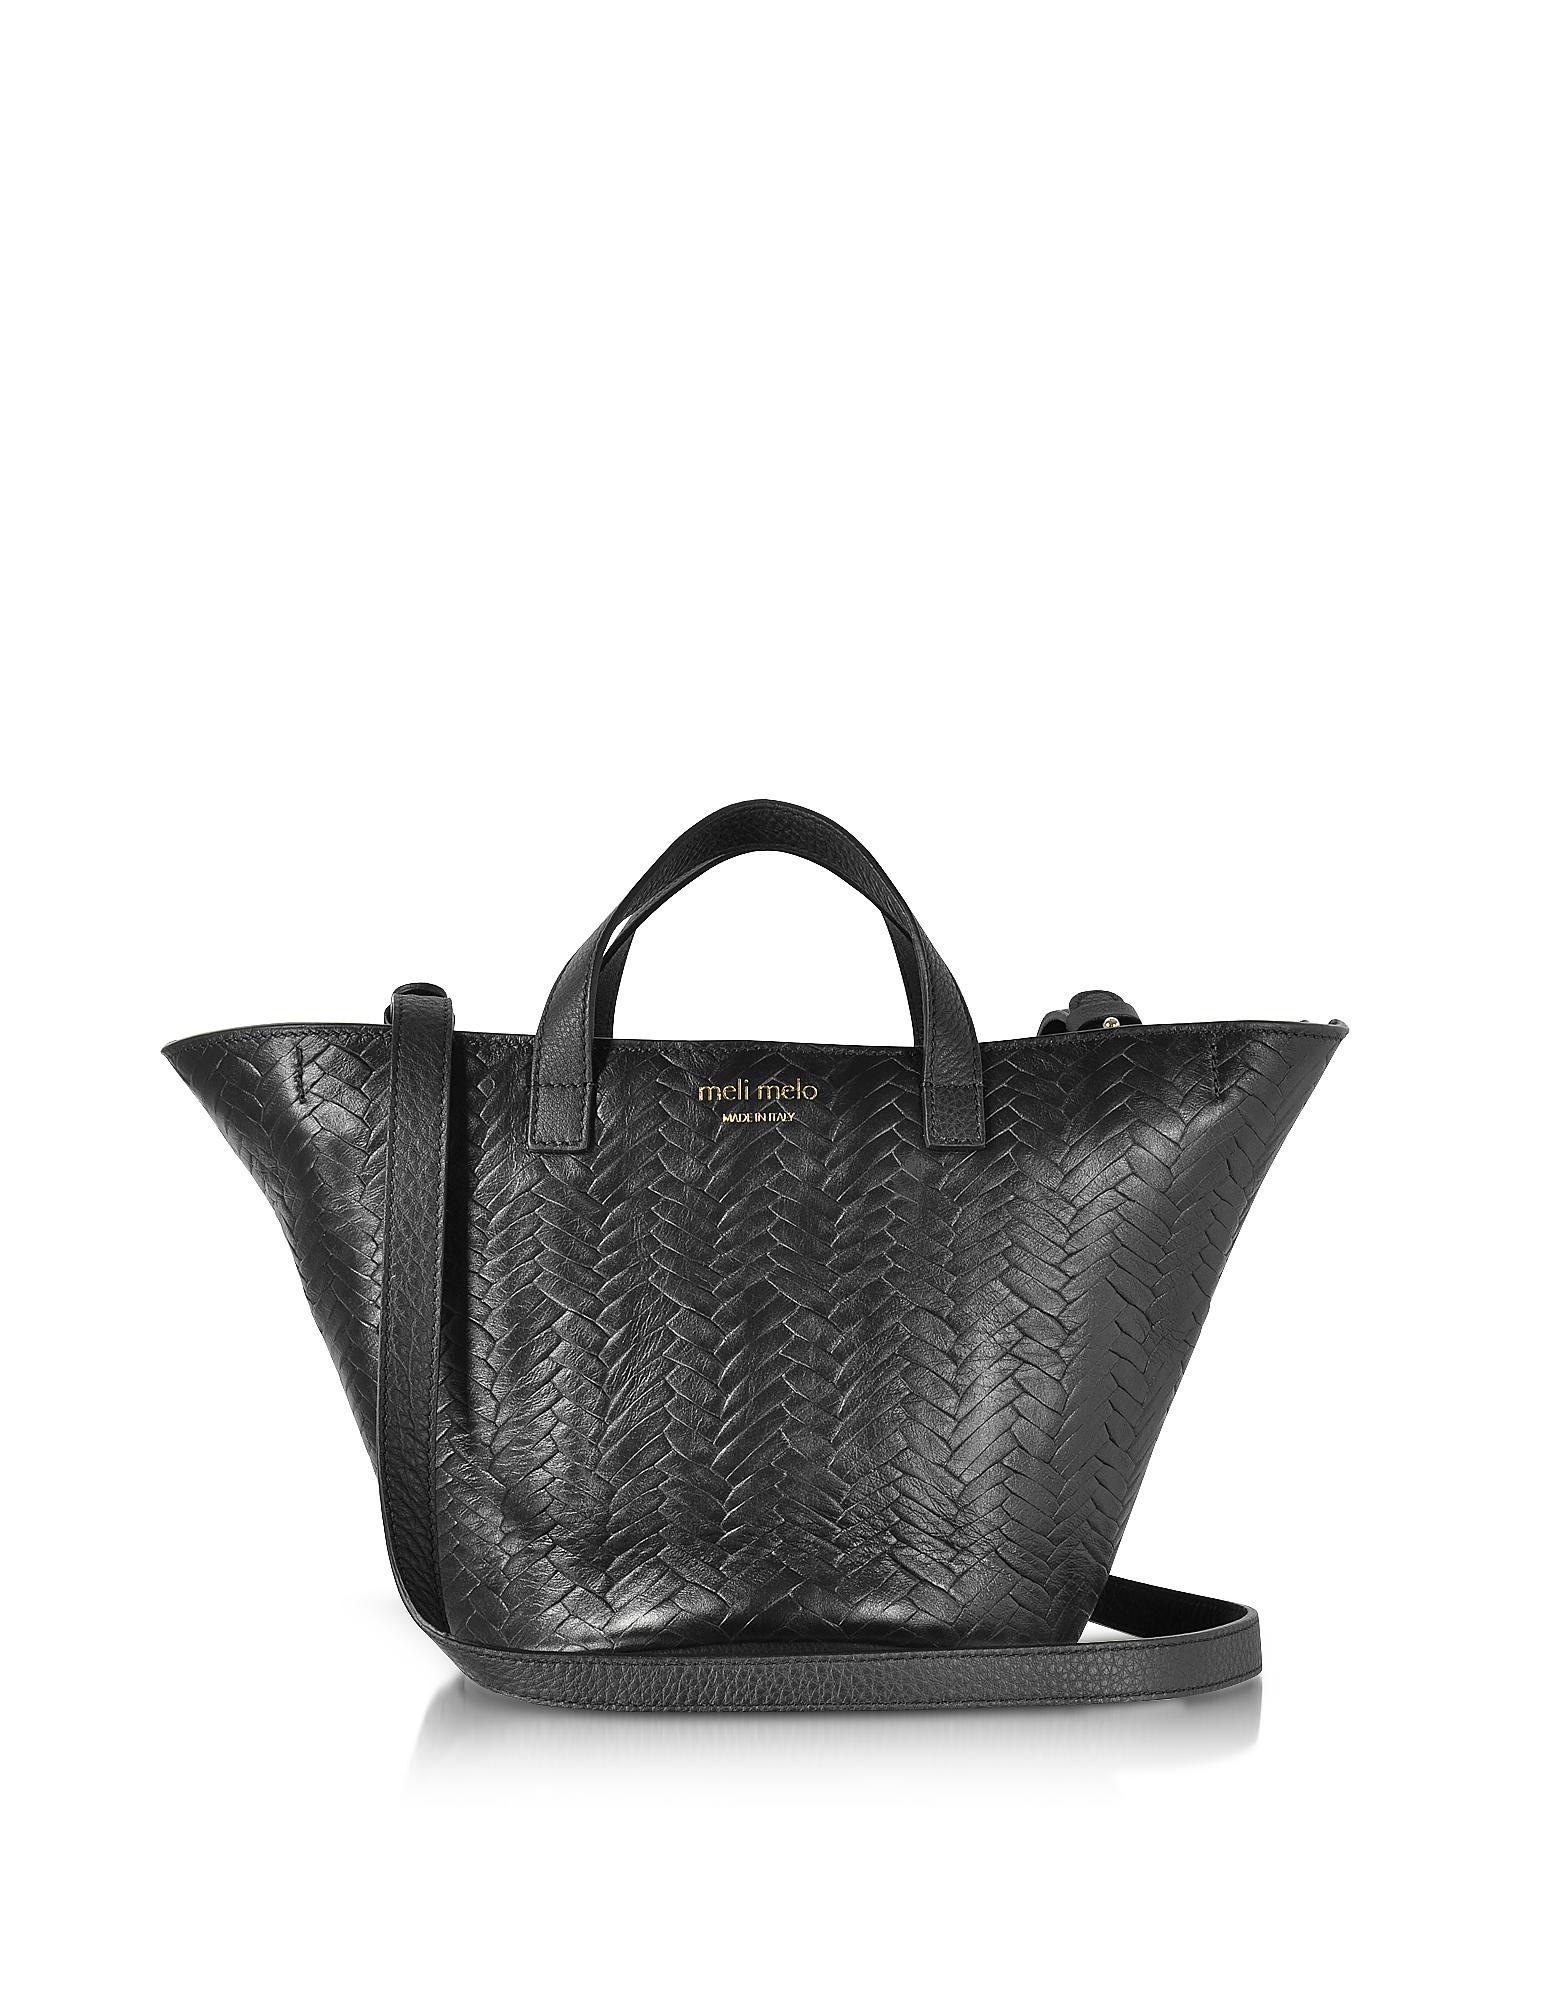 Meli Melo Handbags, Black Woven Leather Rosalia Mini Cross Body Bag